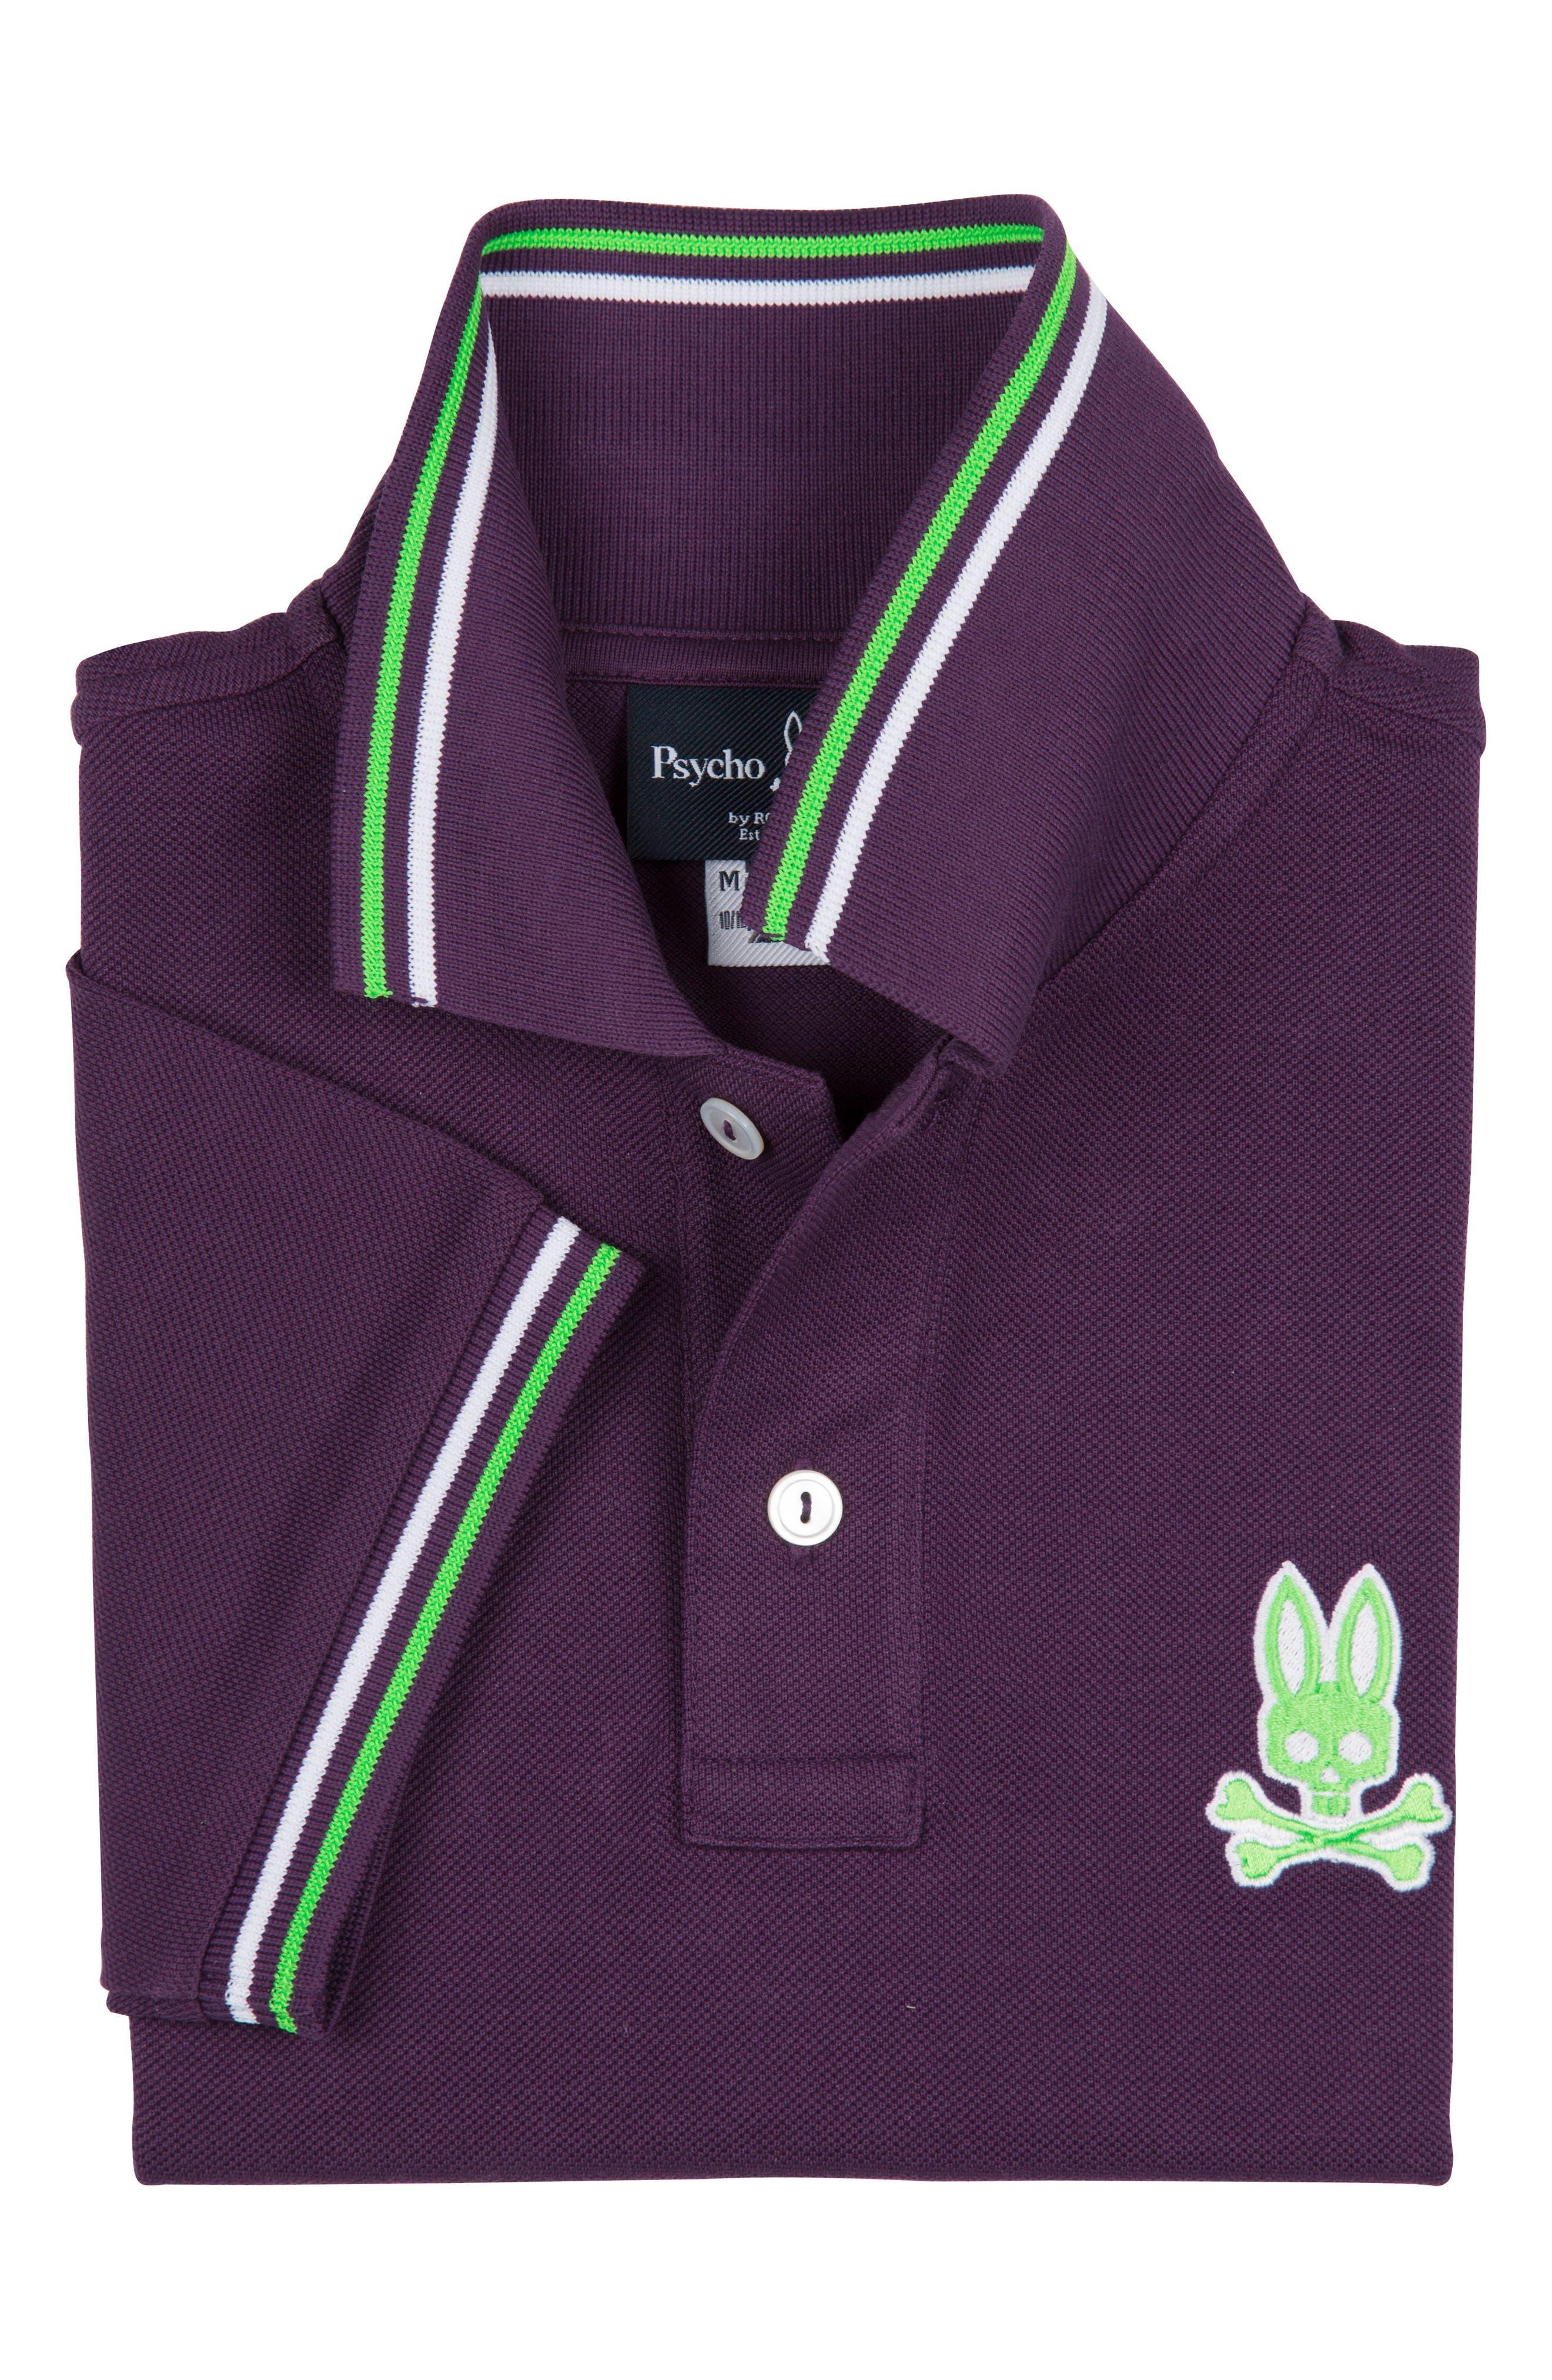 Neon Piqué Pima Cotton Polo,                             Alternate thumbnail 2, color,                             Eggplant